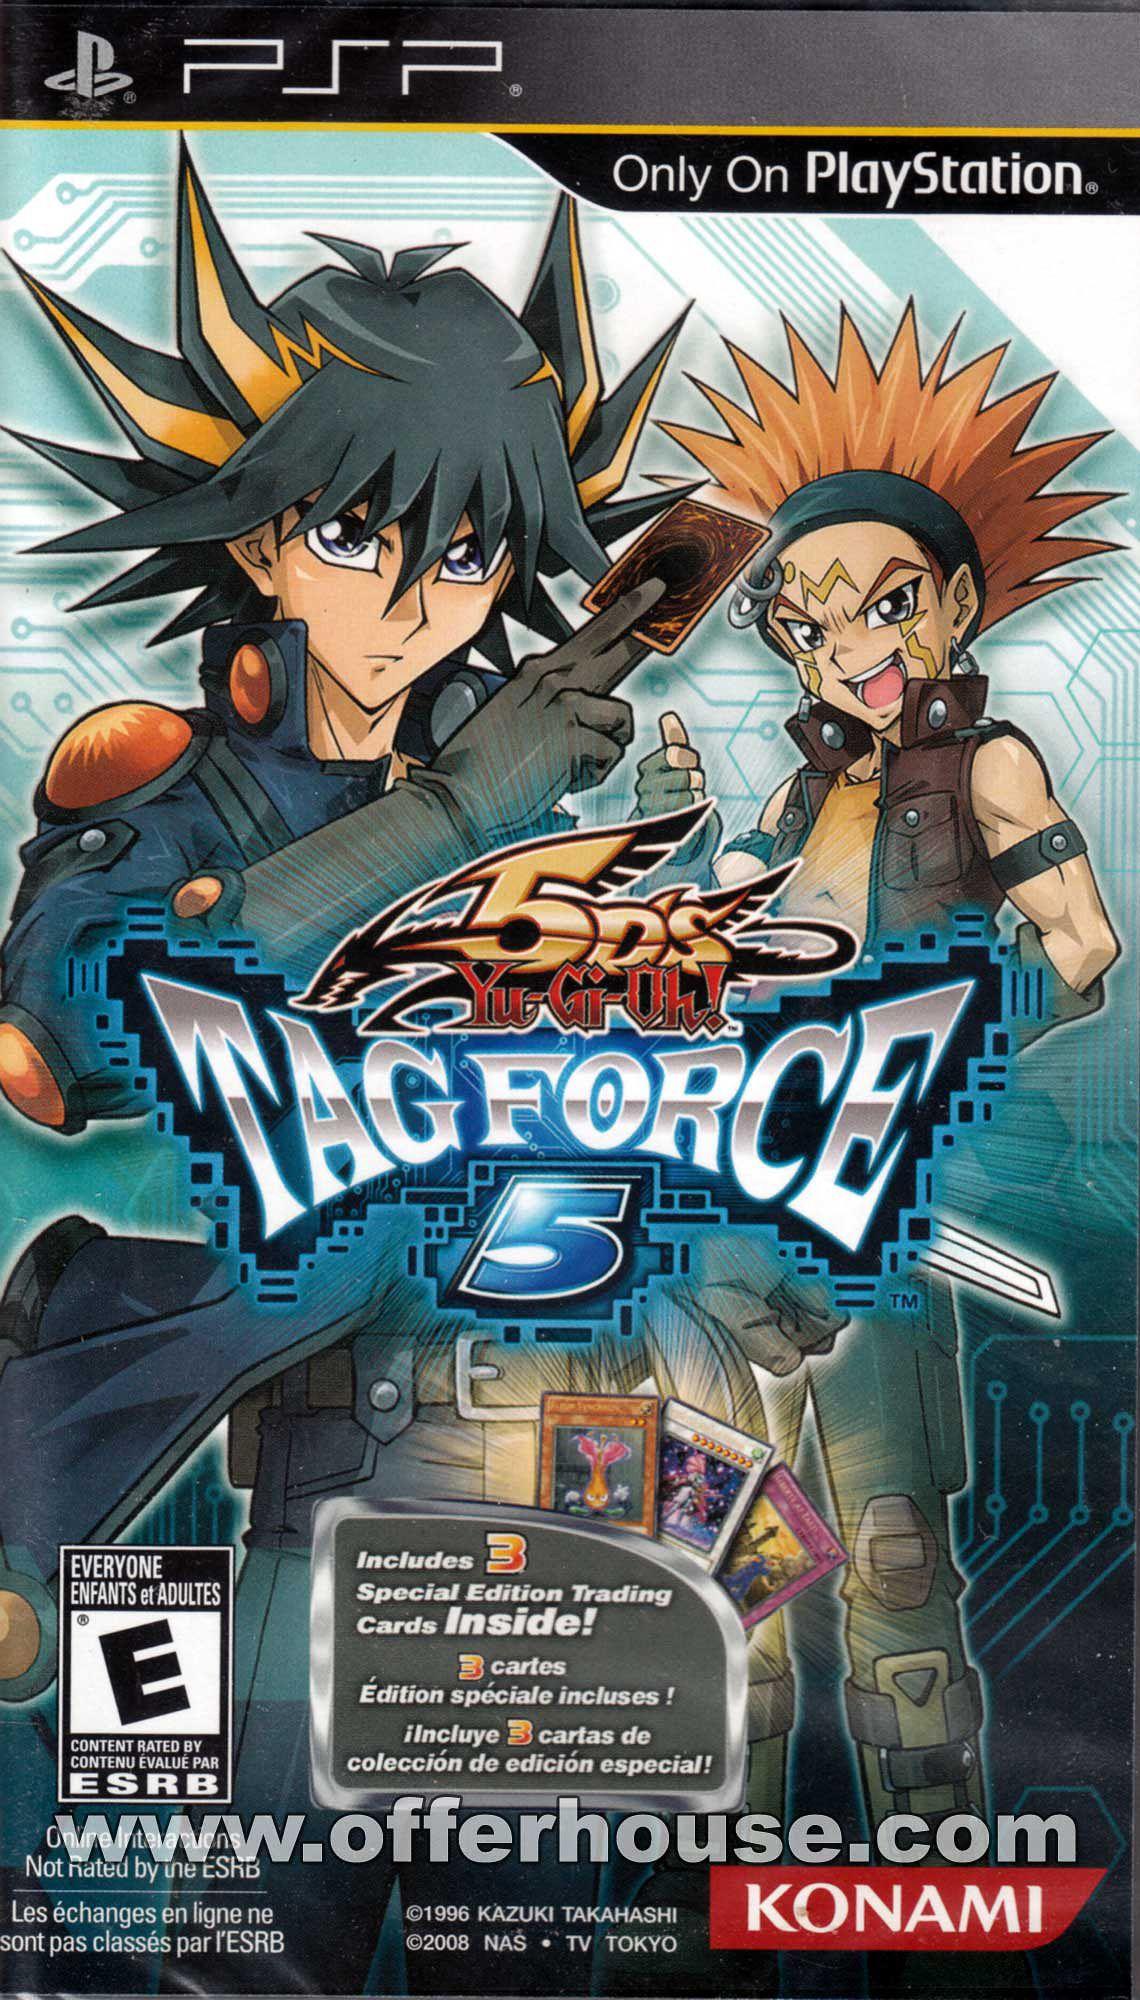 Yu Gi Oh 5ds Tag Force 5 Yugioh Psp Yu Gi Oh 5d S